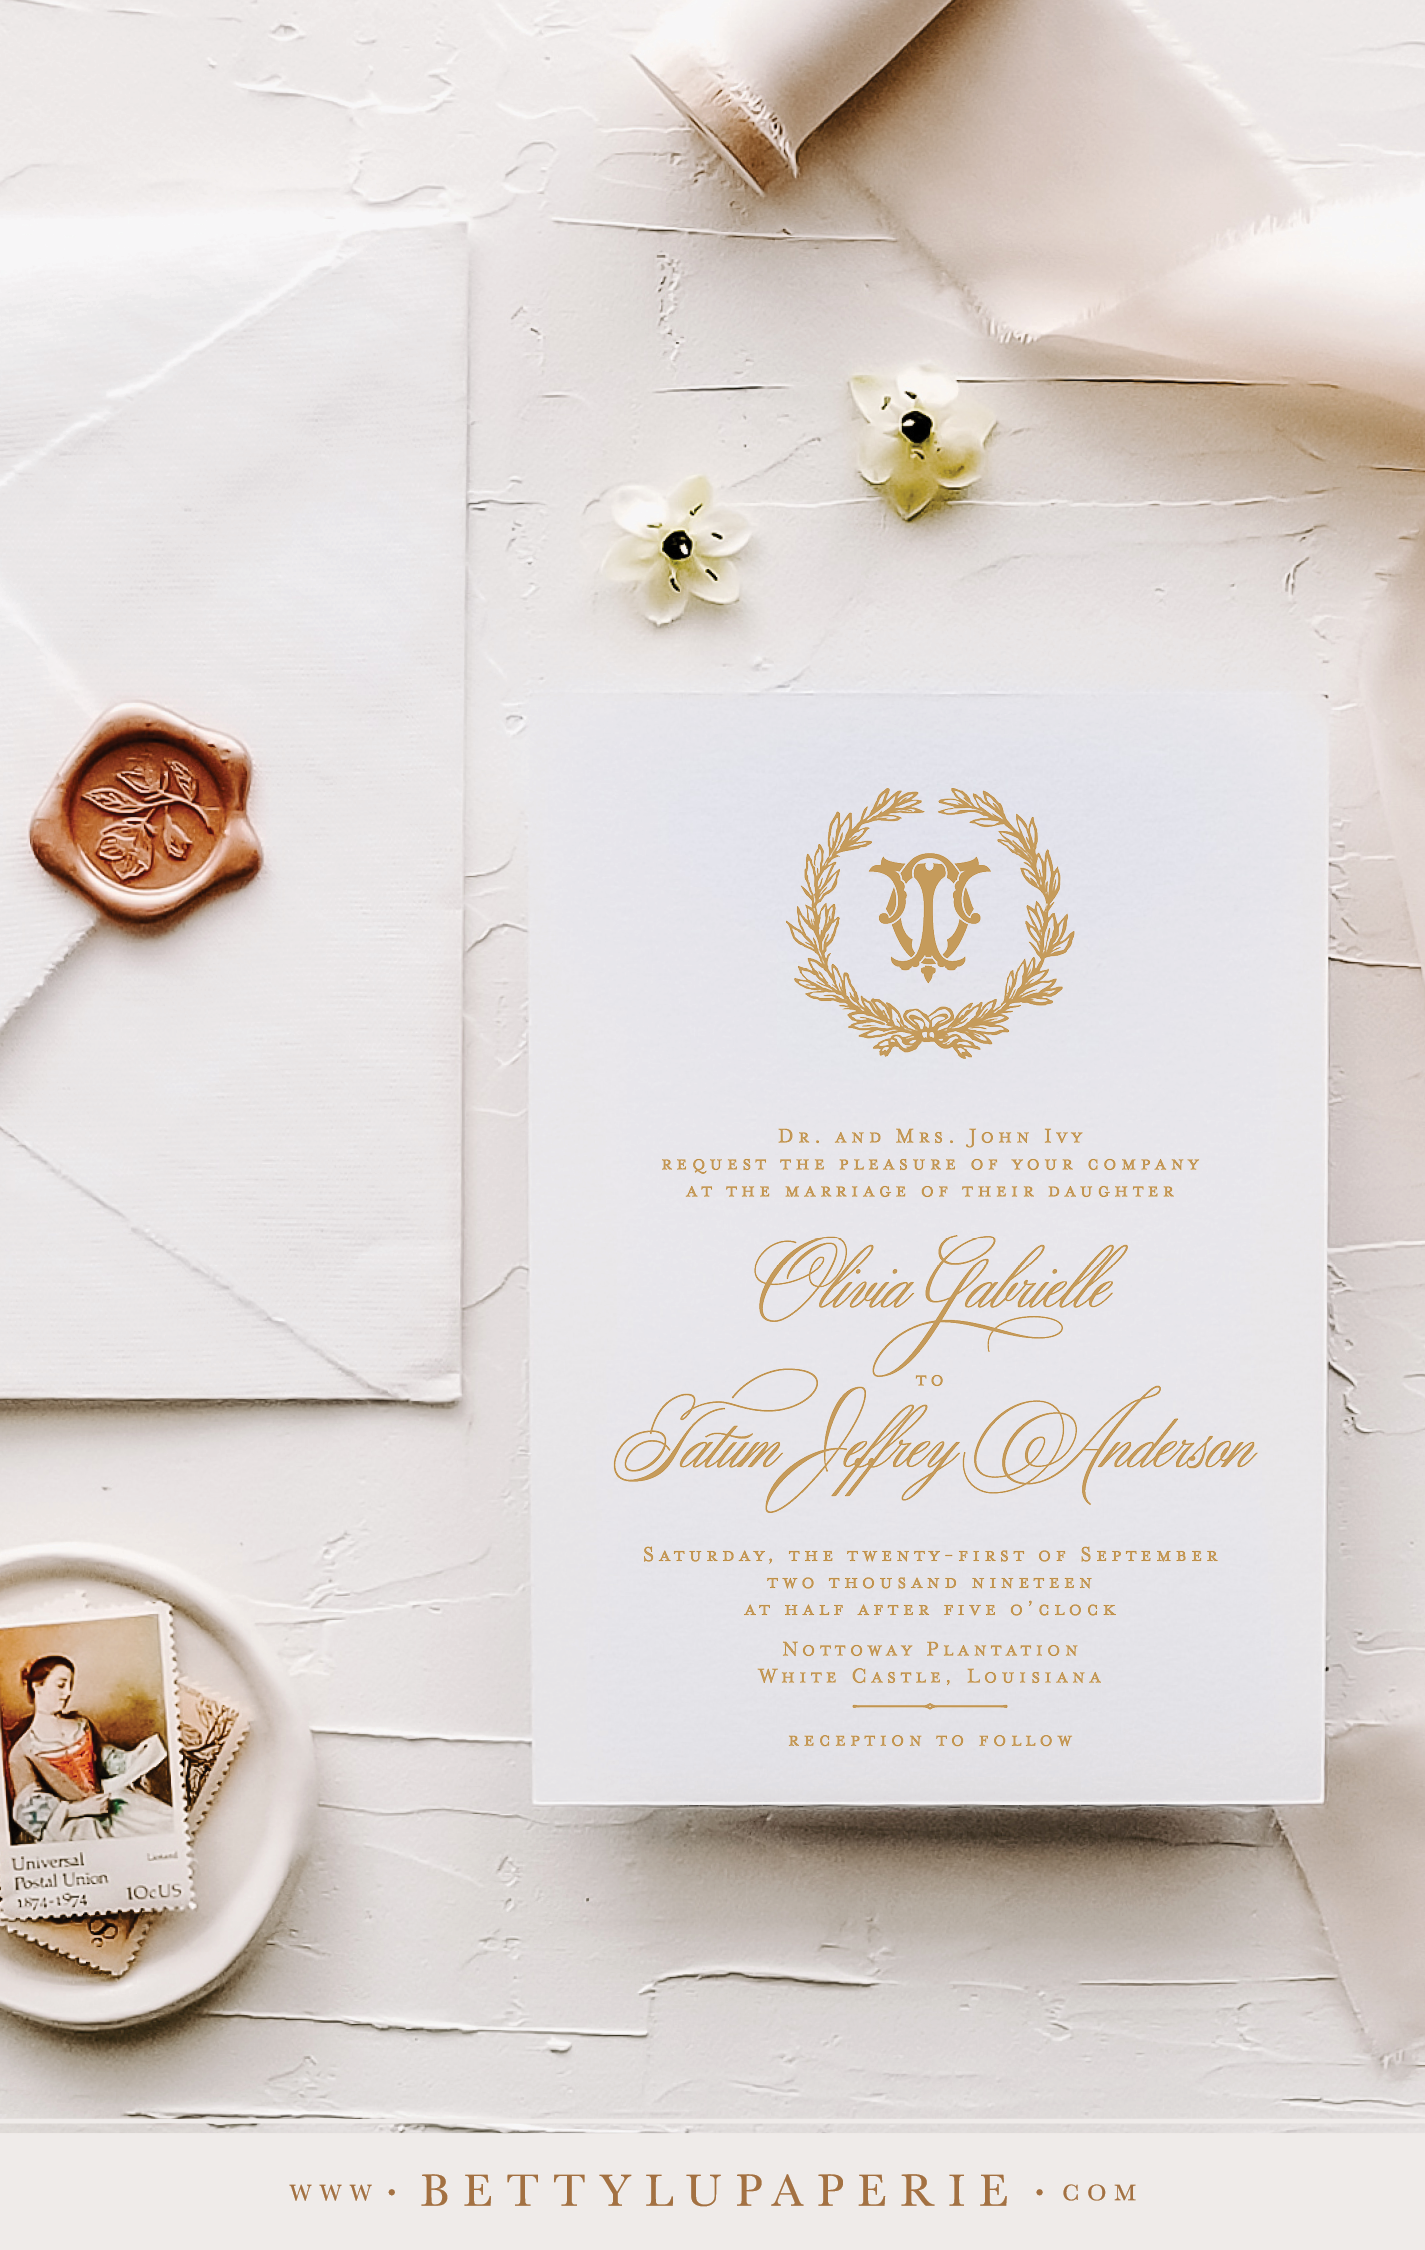 Elegant Wedding Invitations Printed Wedding Invitation Suite Wedding Invitation Inspiration Printing Wedding Invitations Classy Wedding Invitations